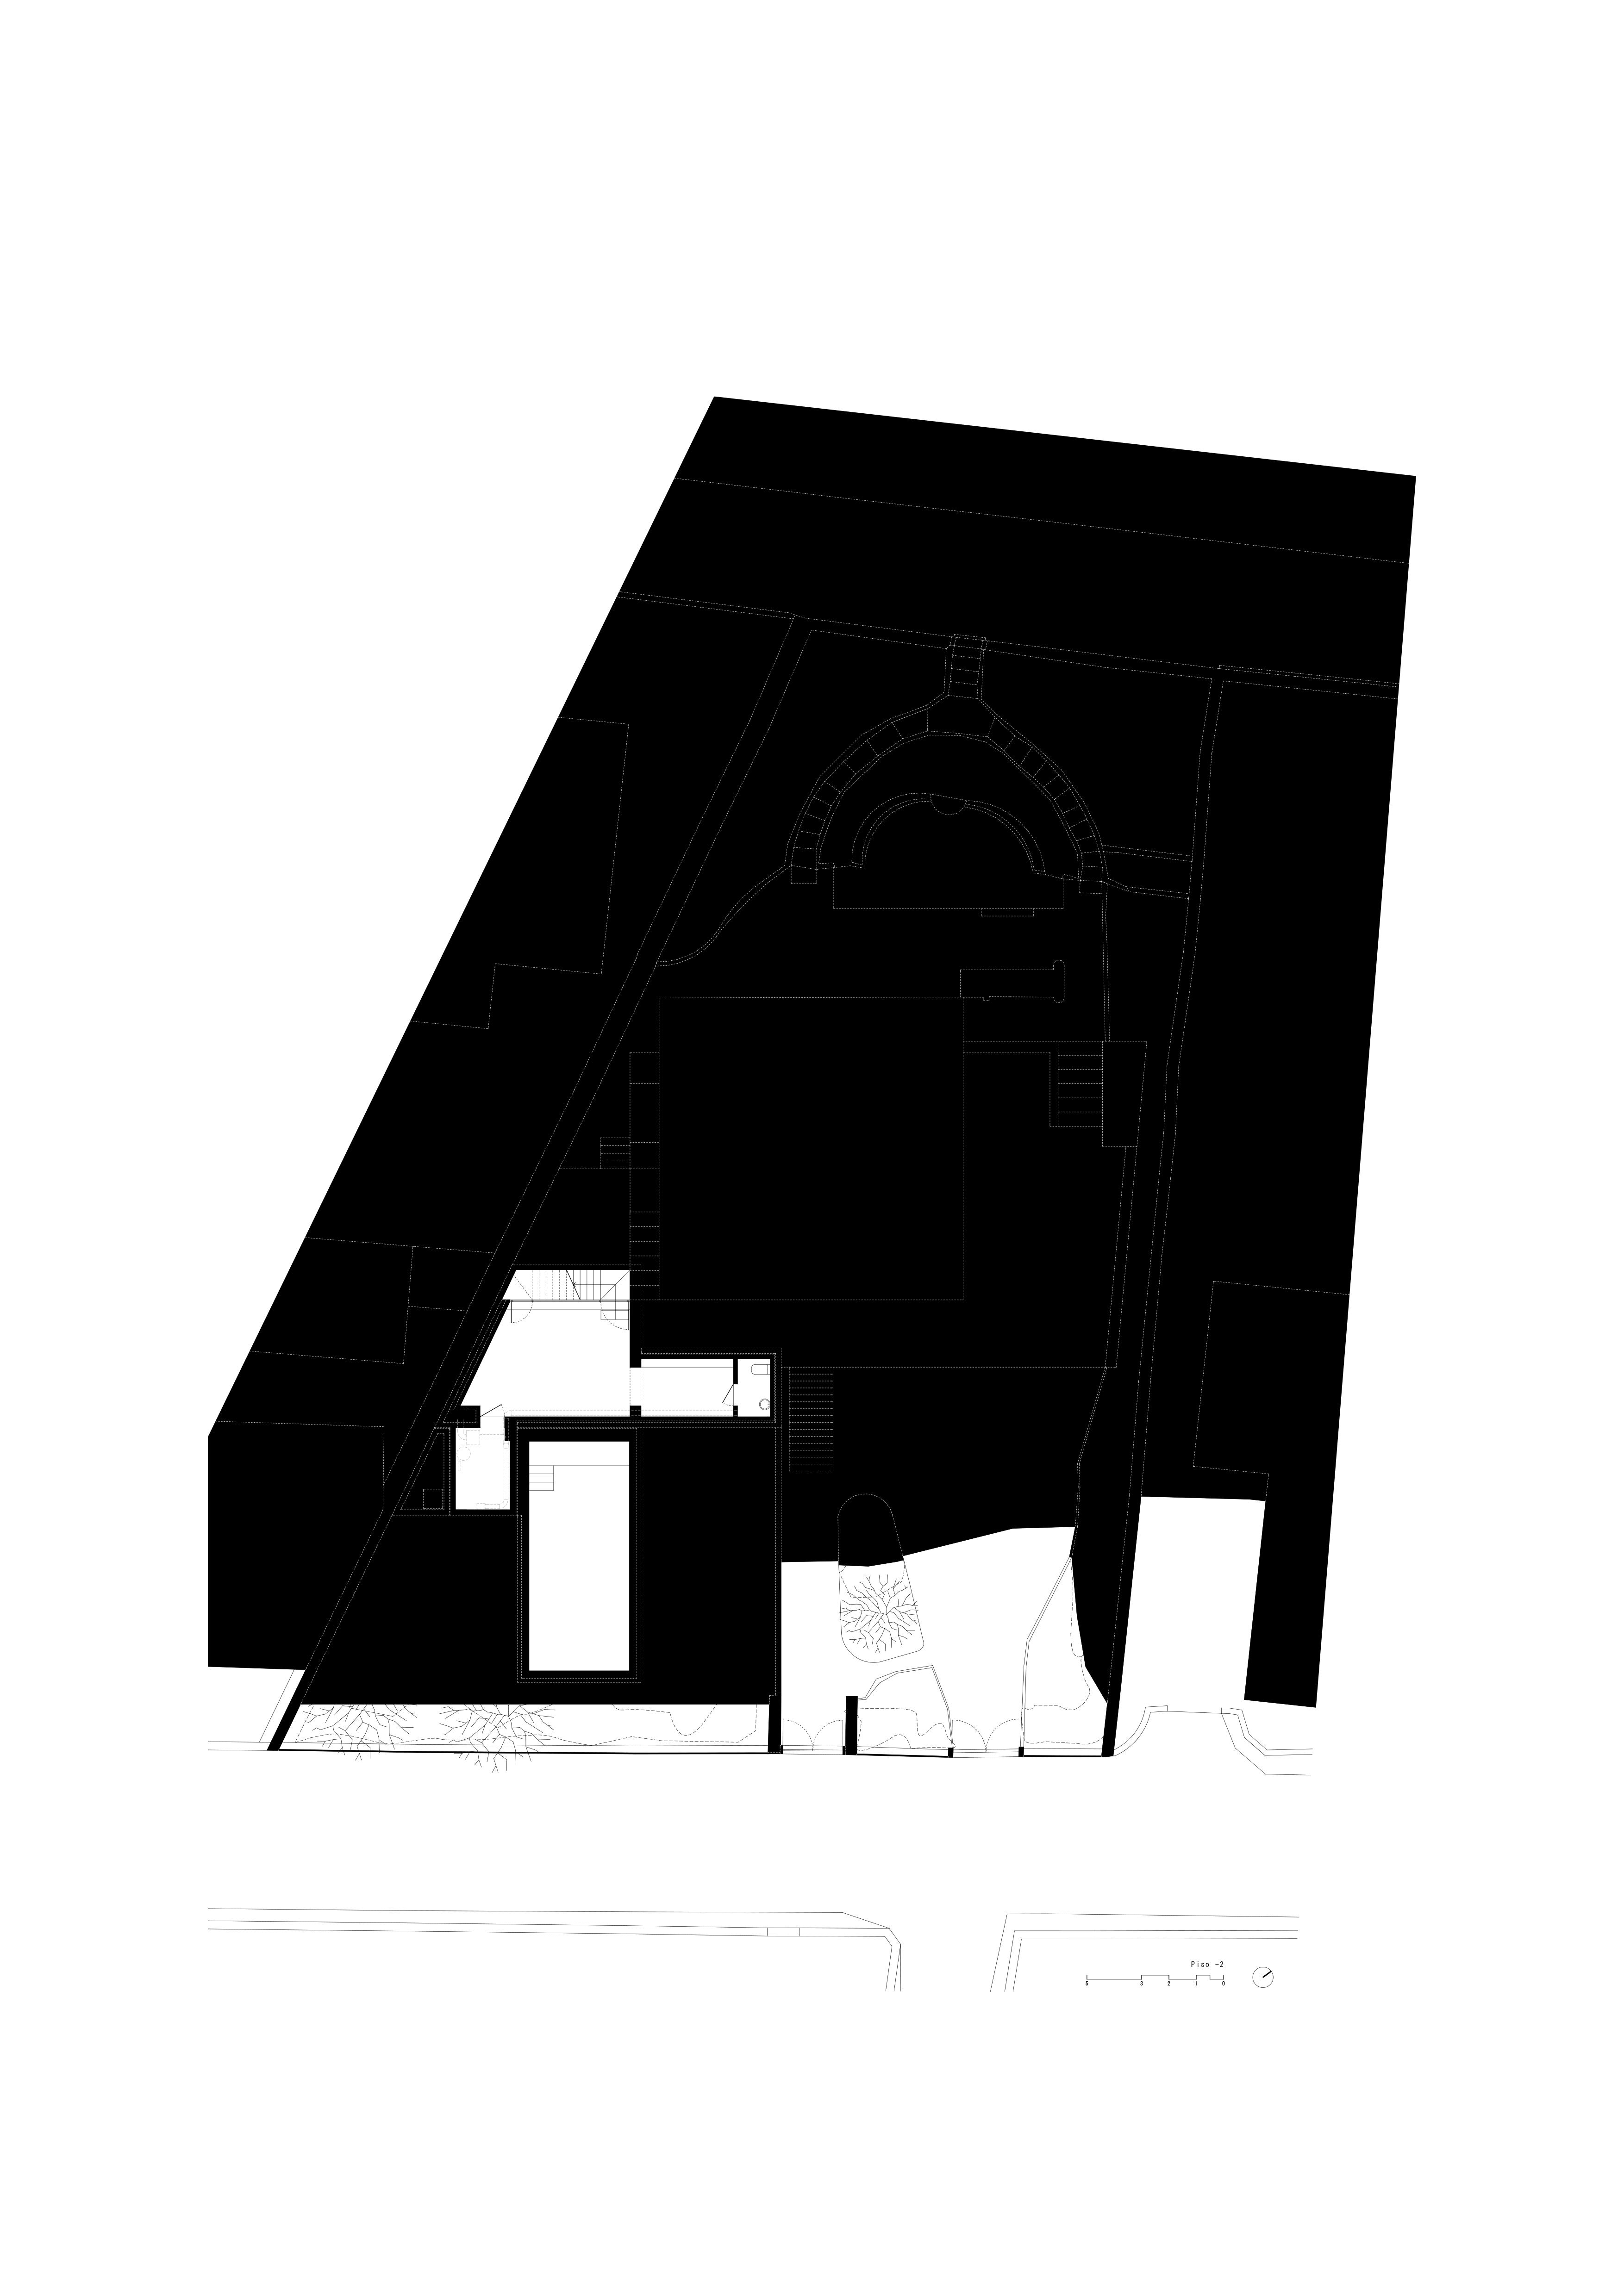 00 ARCHDAILY_Casa Alexius_Piso -2